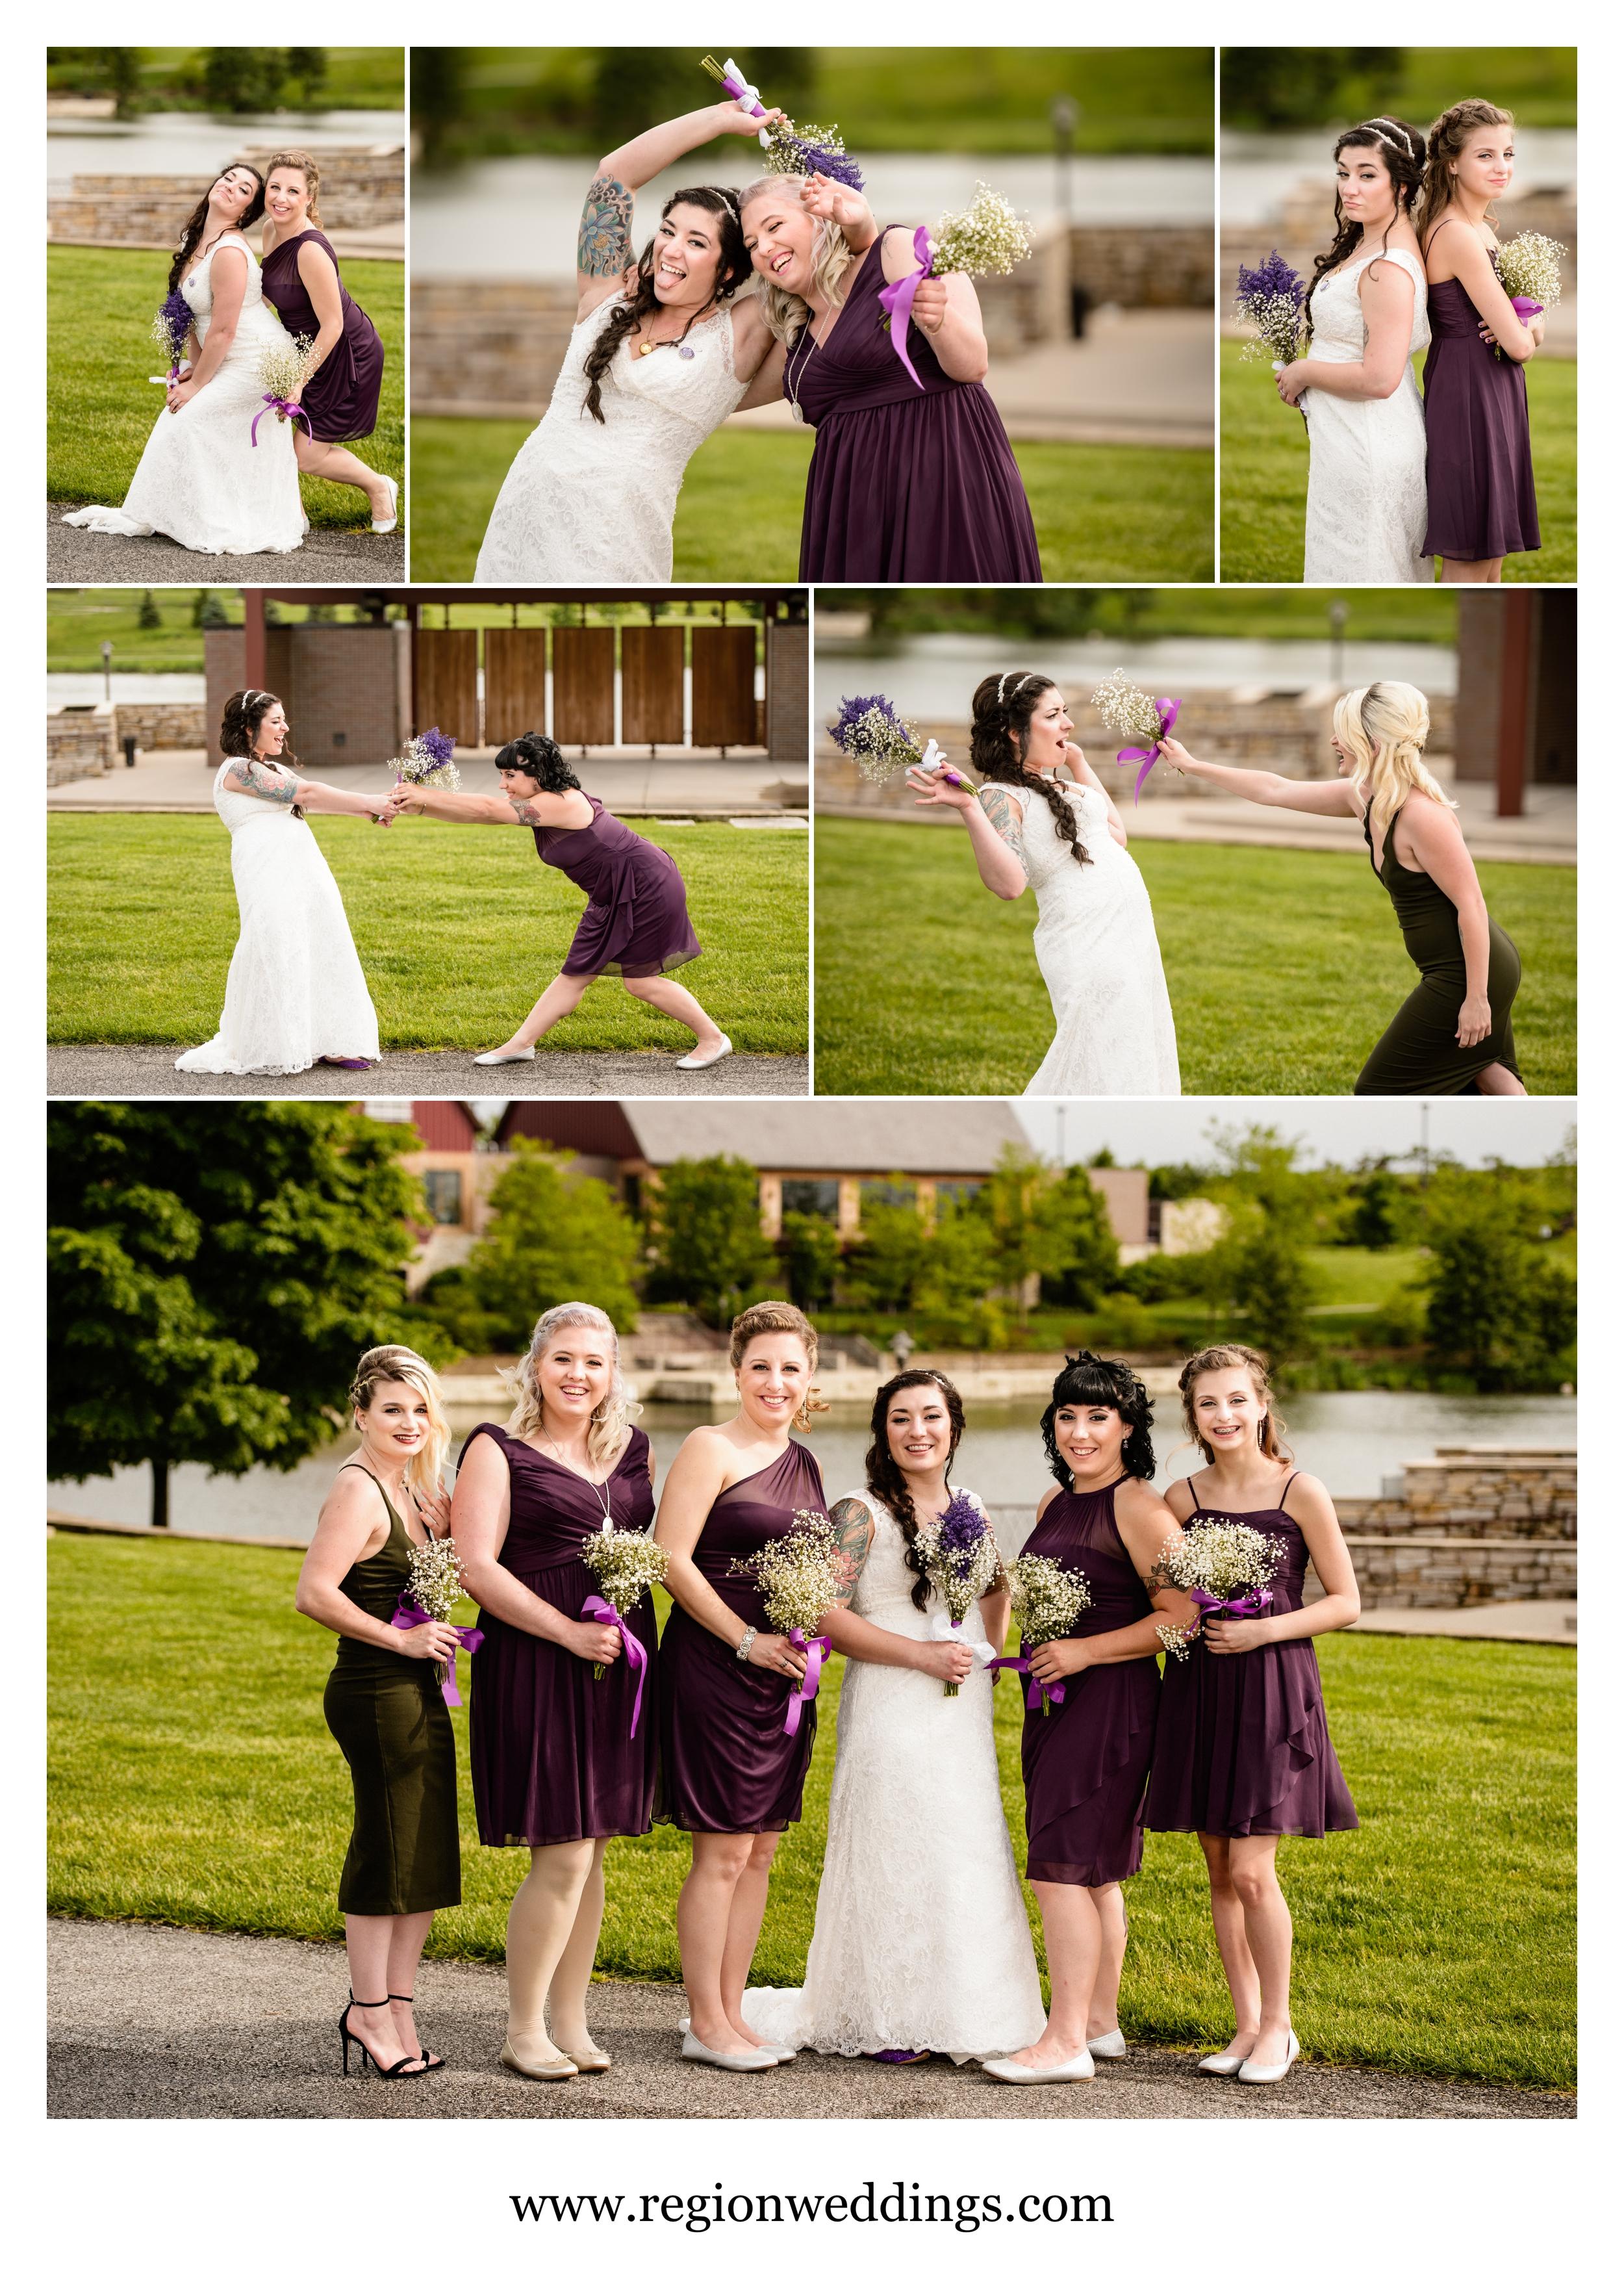 Fun bridesmaids photos at Centennial Park.